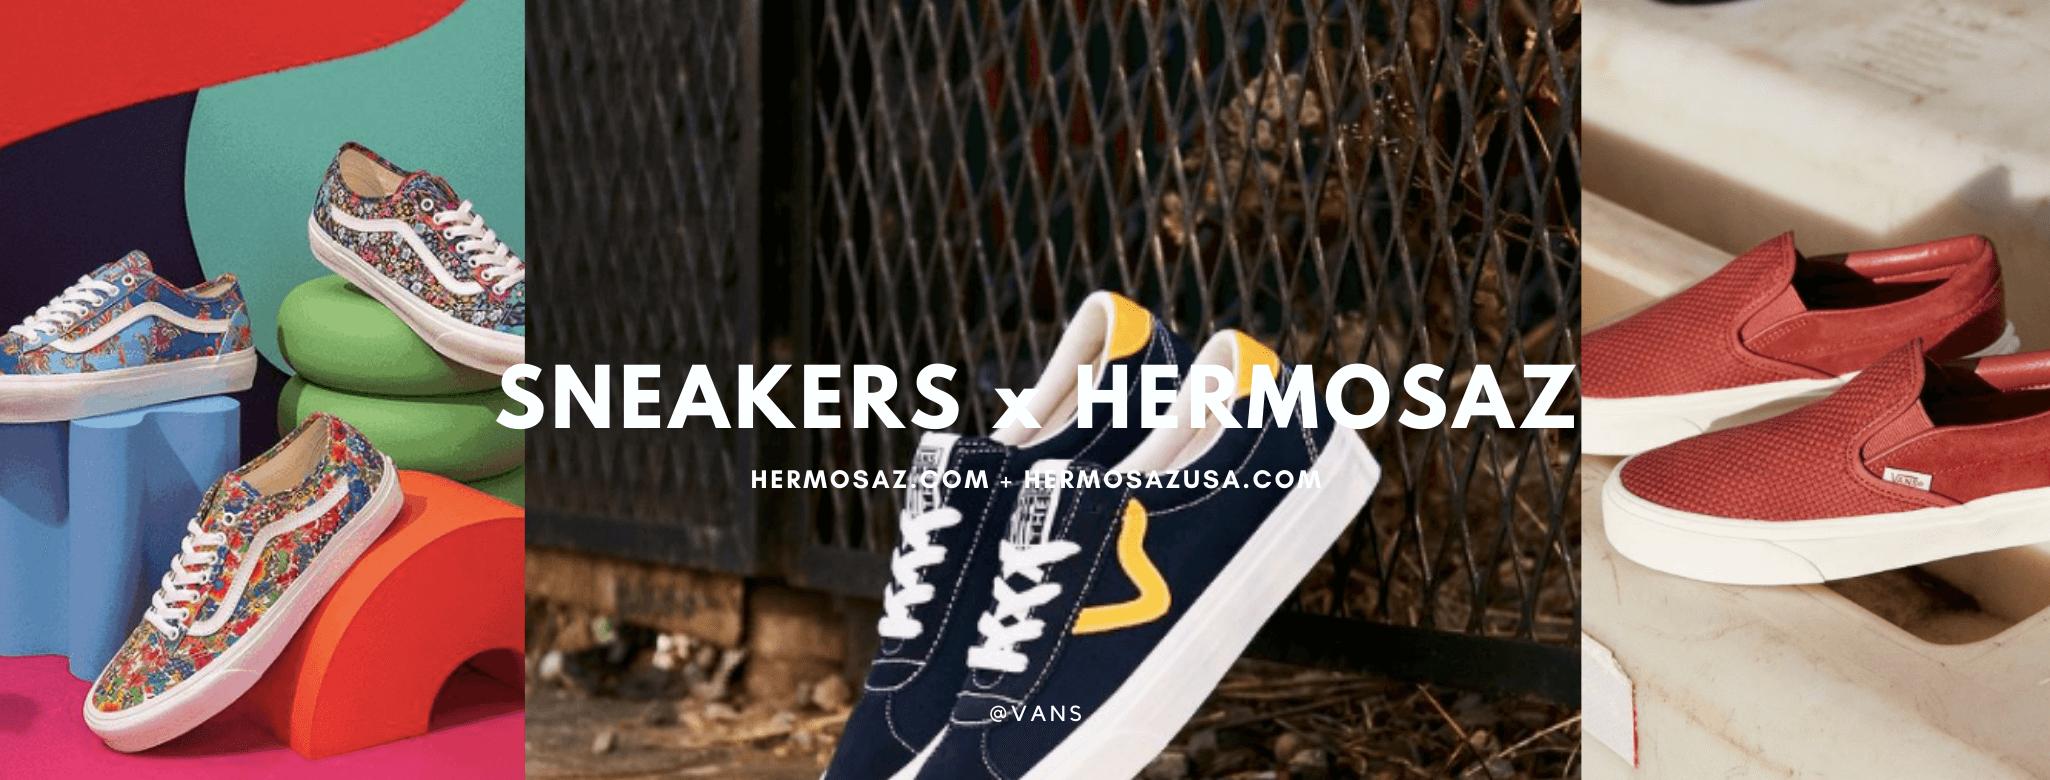 Sneakers x Hermosaz